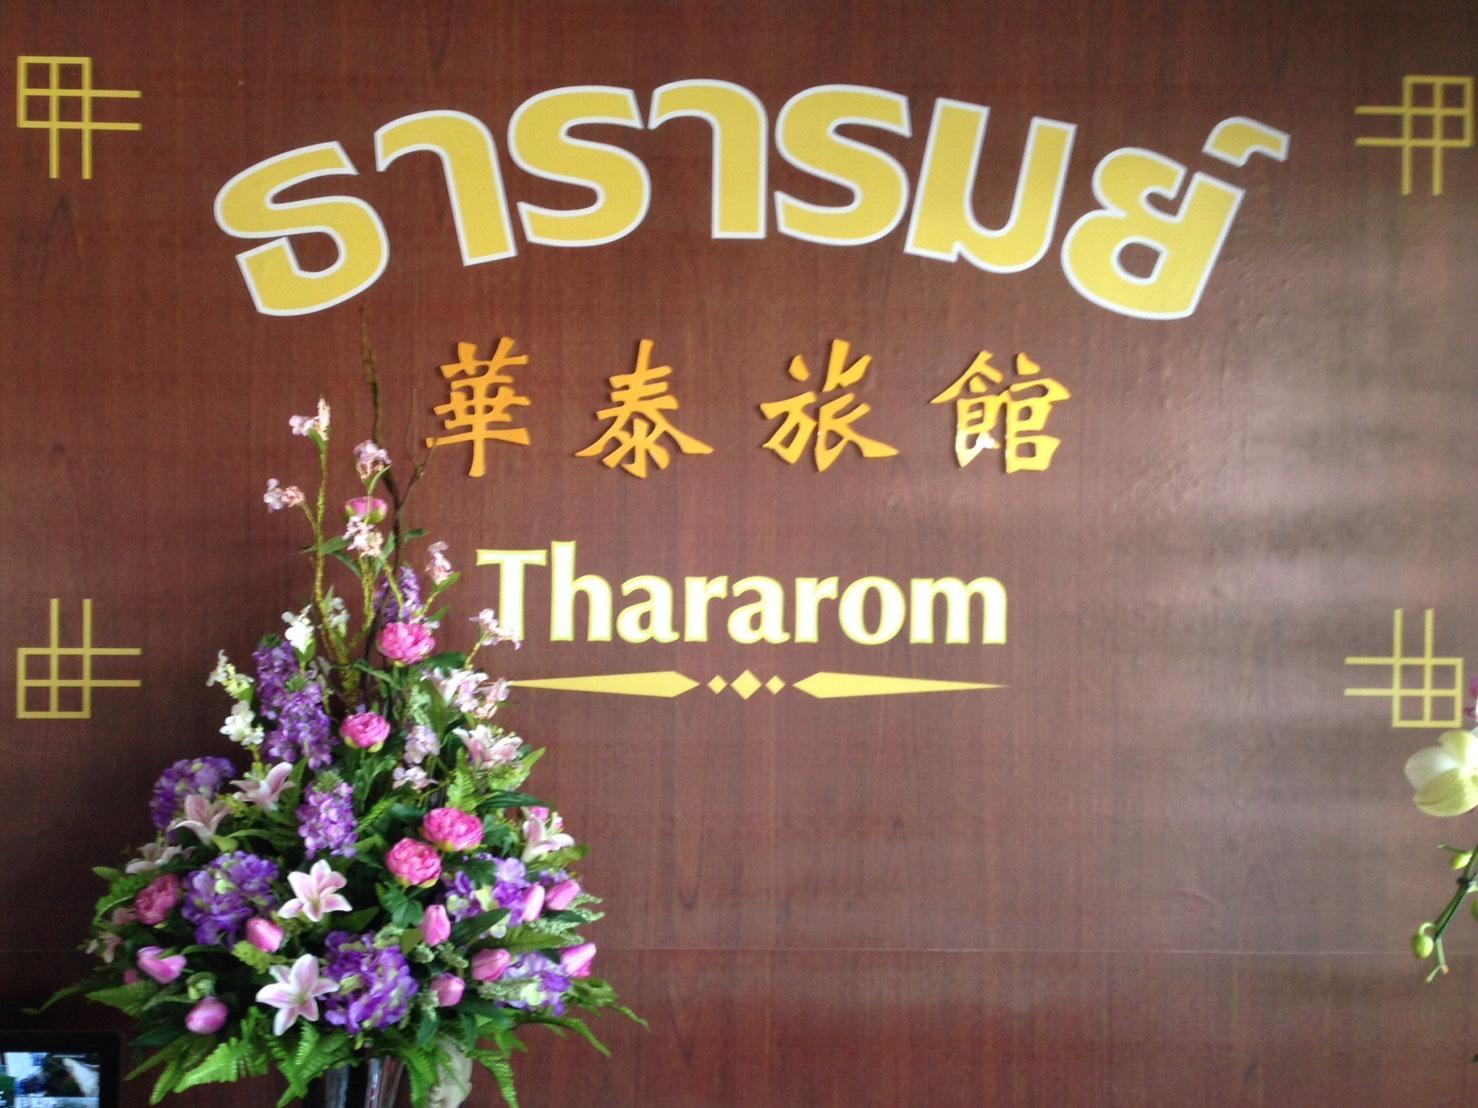 Thararom